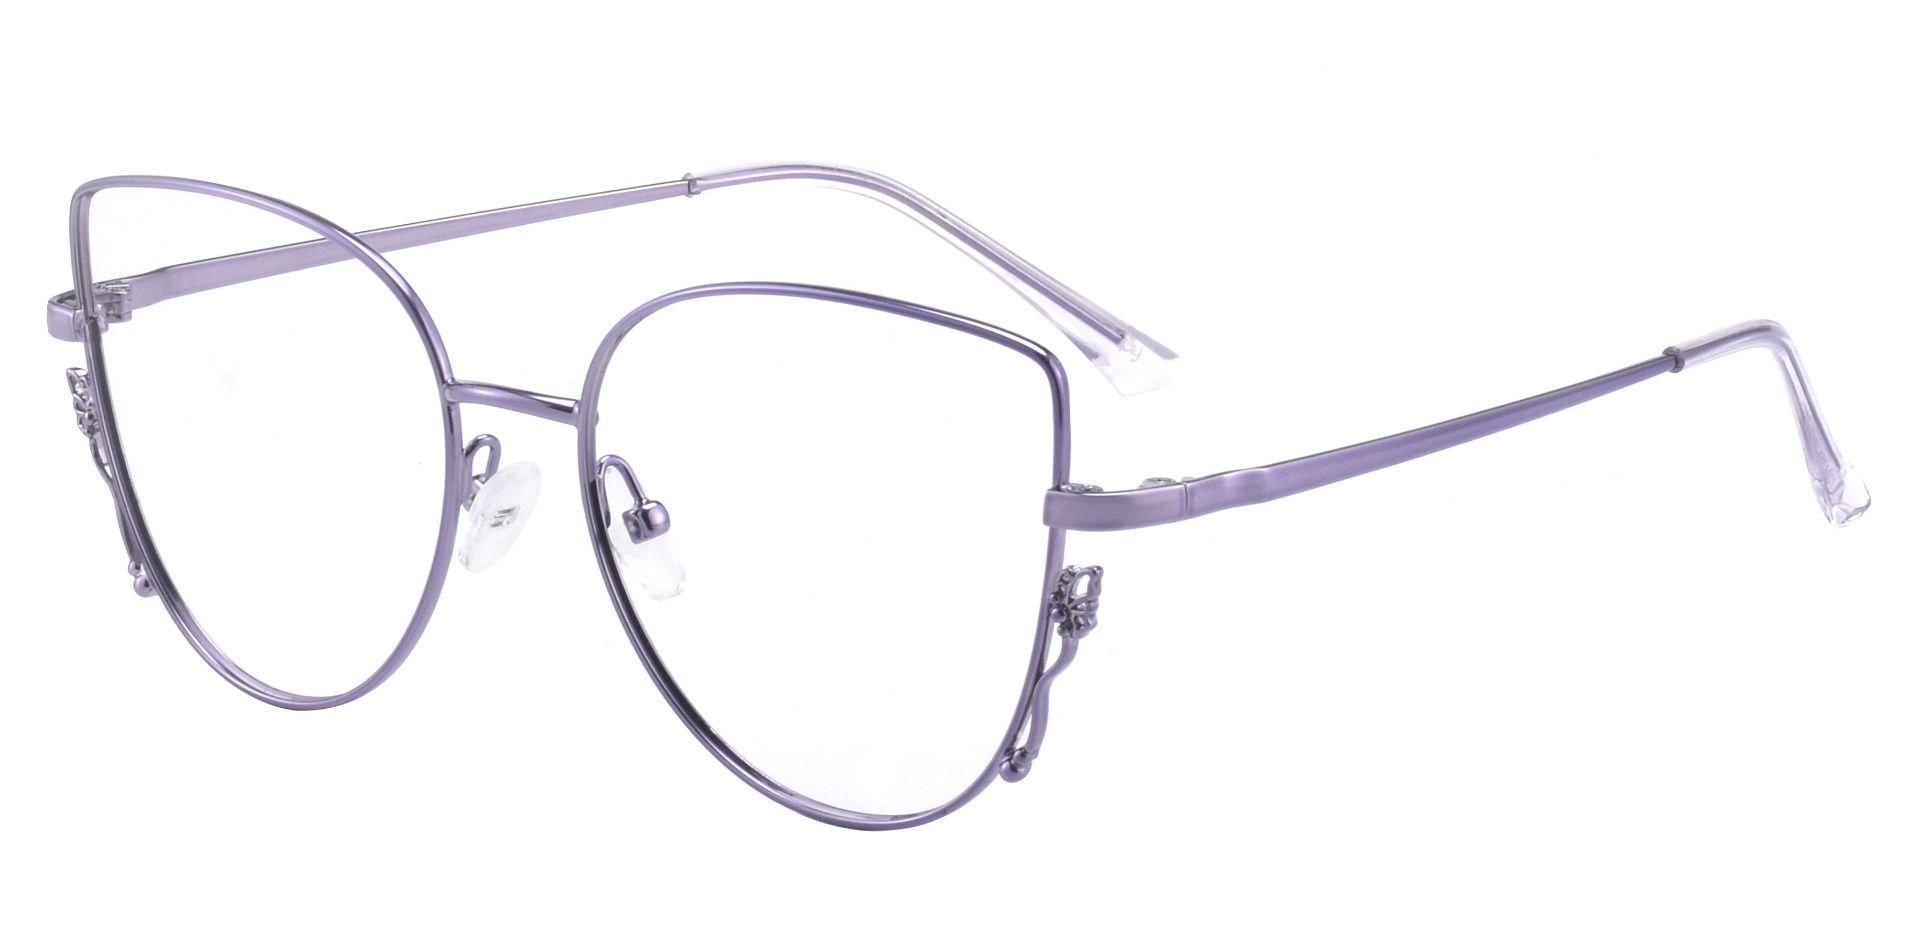 Fontella Cat Eye Prescription Glasses - Purple